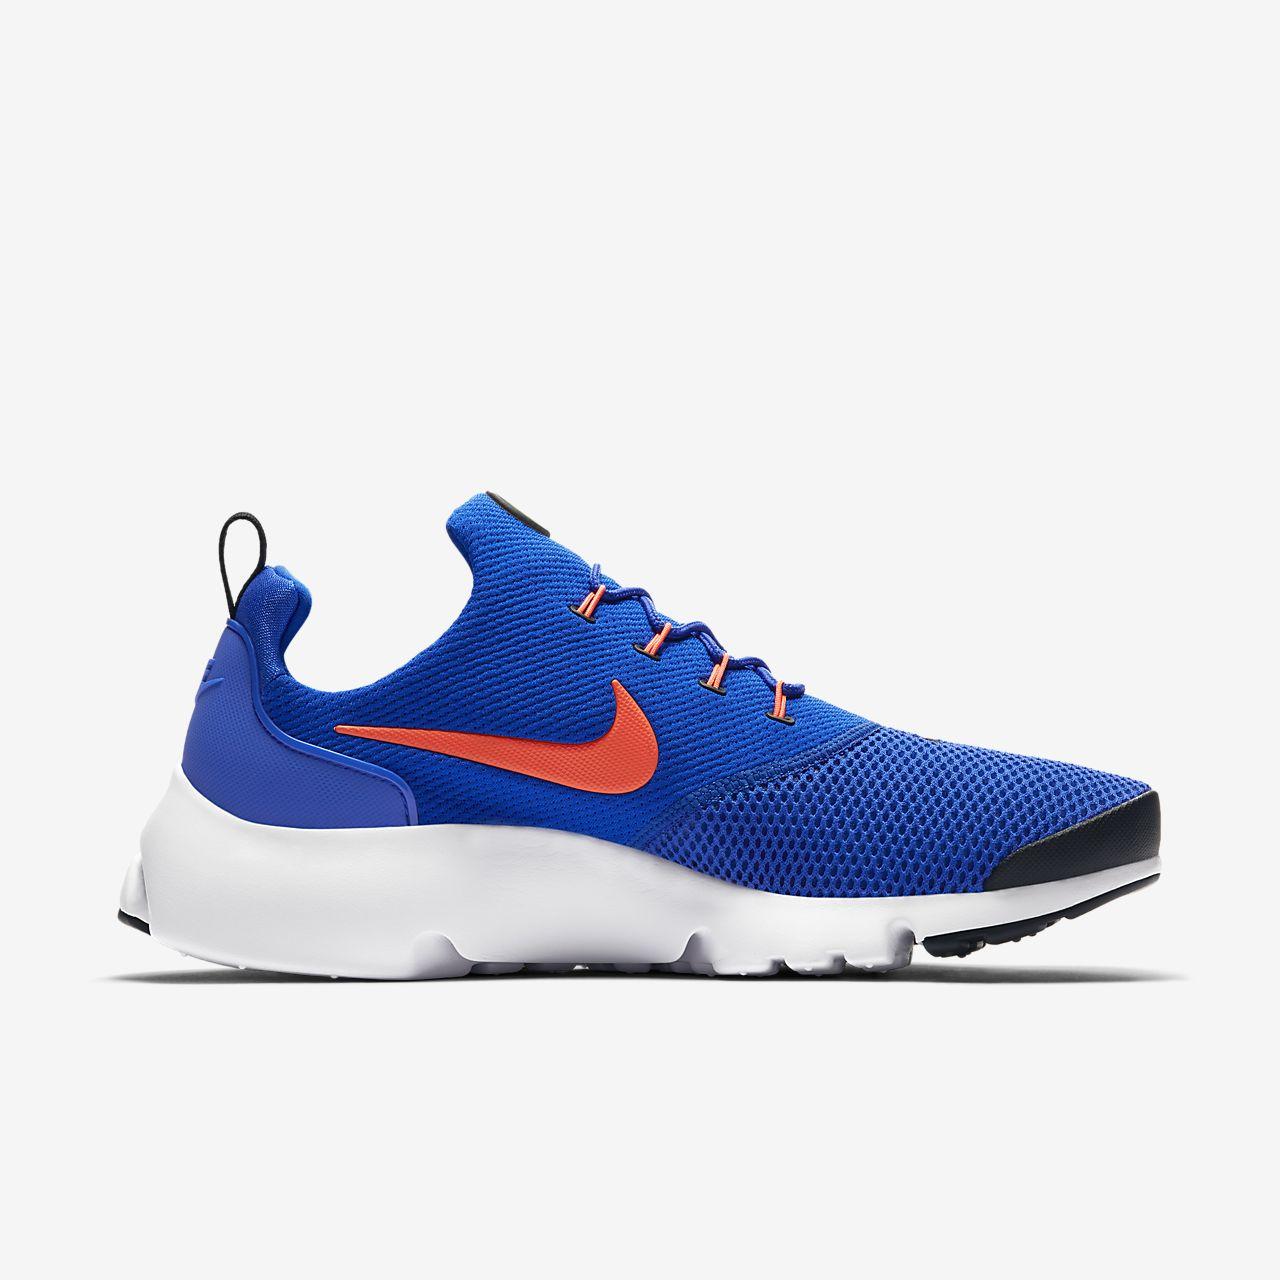 fc7ad163668 Nike Presto Fly Men s Shoe. Nike.com GB